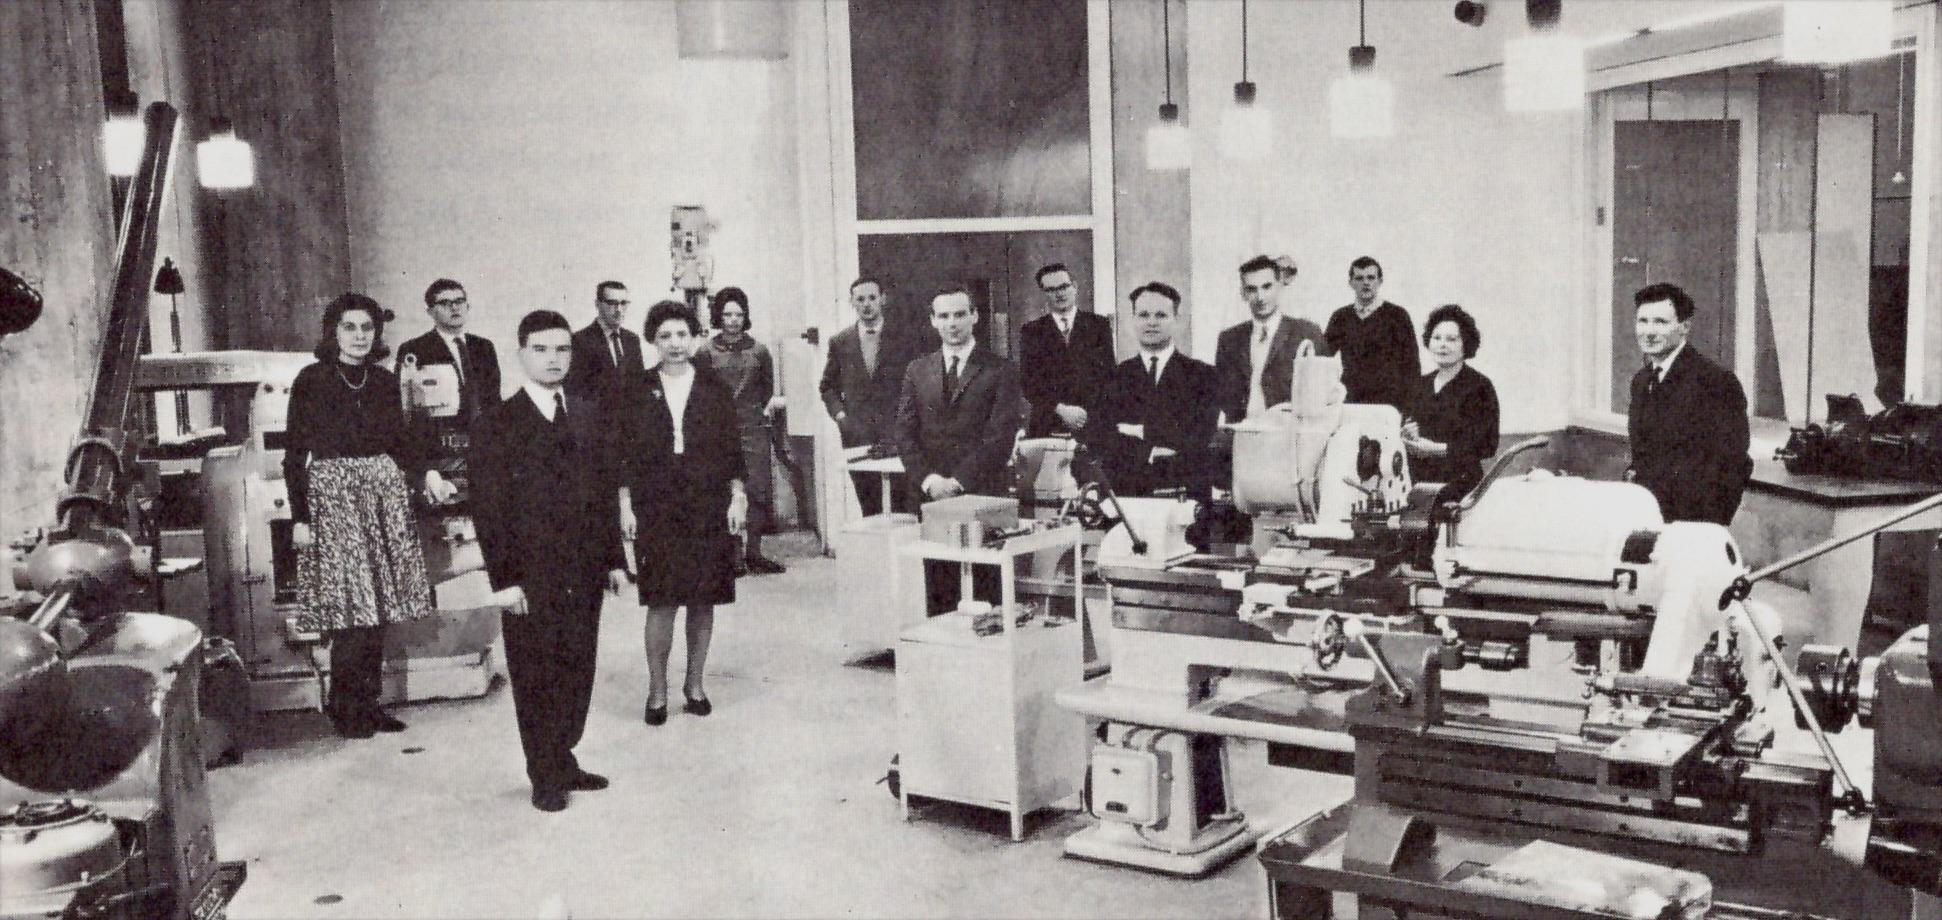 DDR_Group_Photo_pre1965.jpg